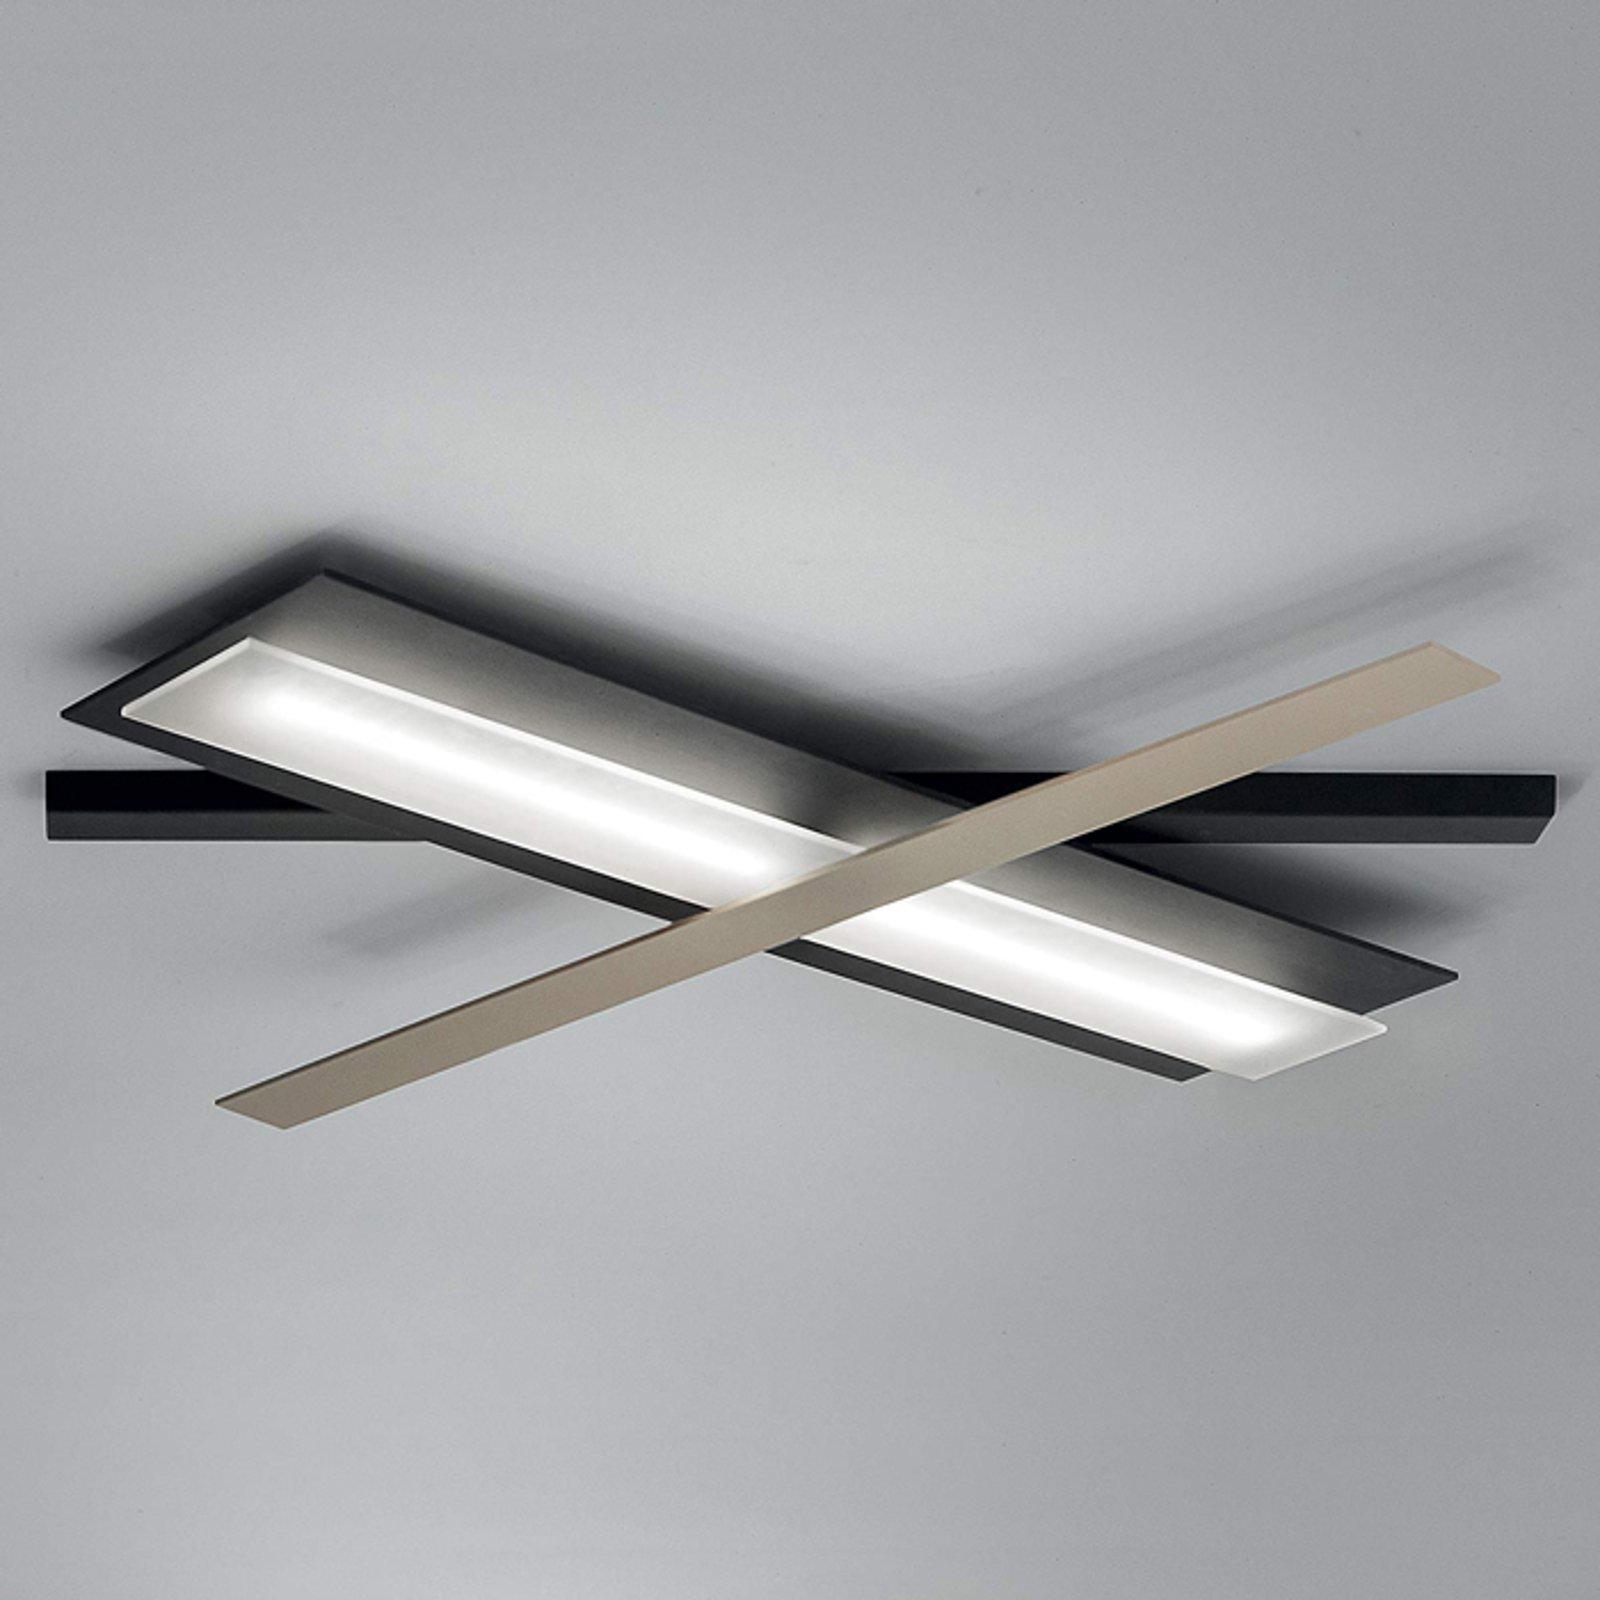 Eclips_S fleksibel justerbar LED-taklampe